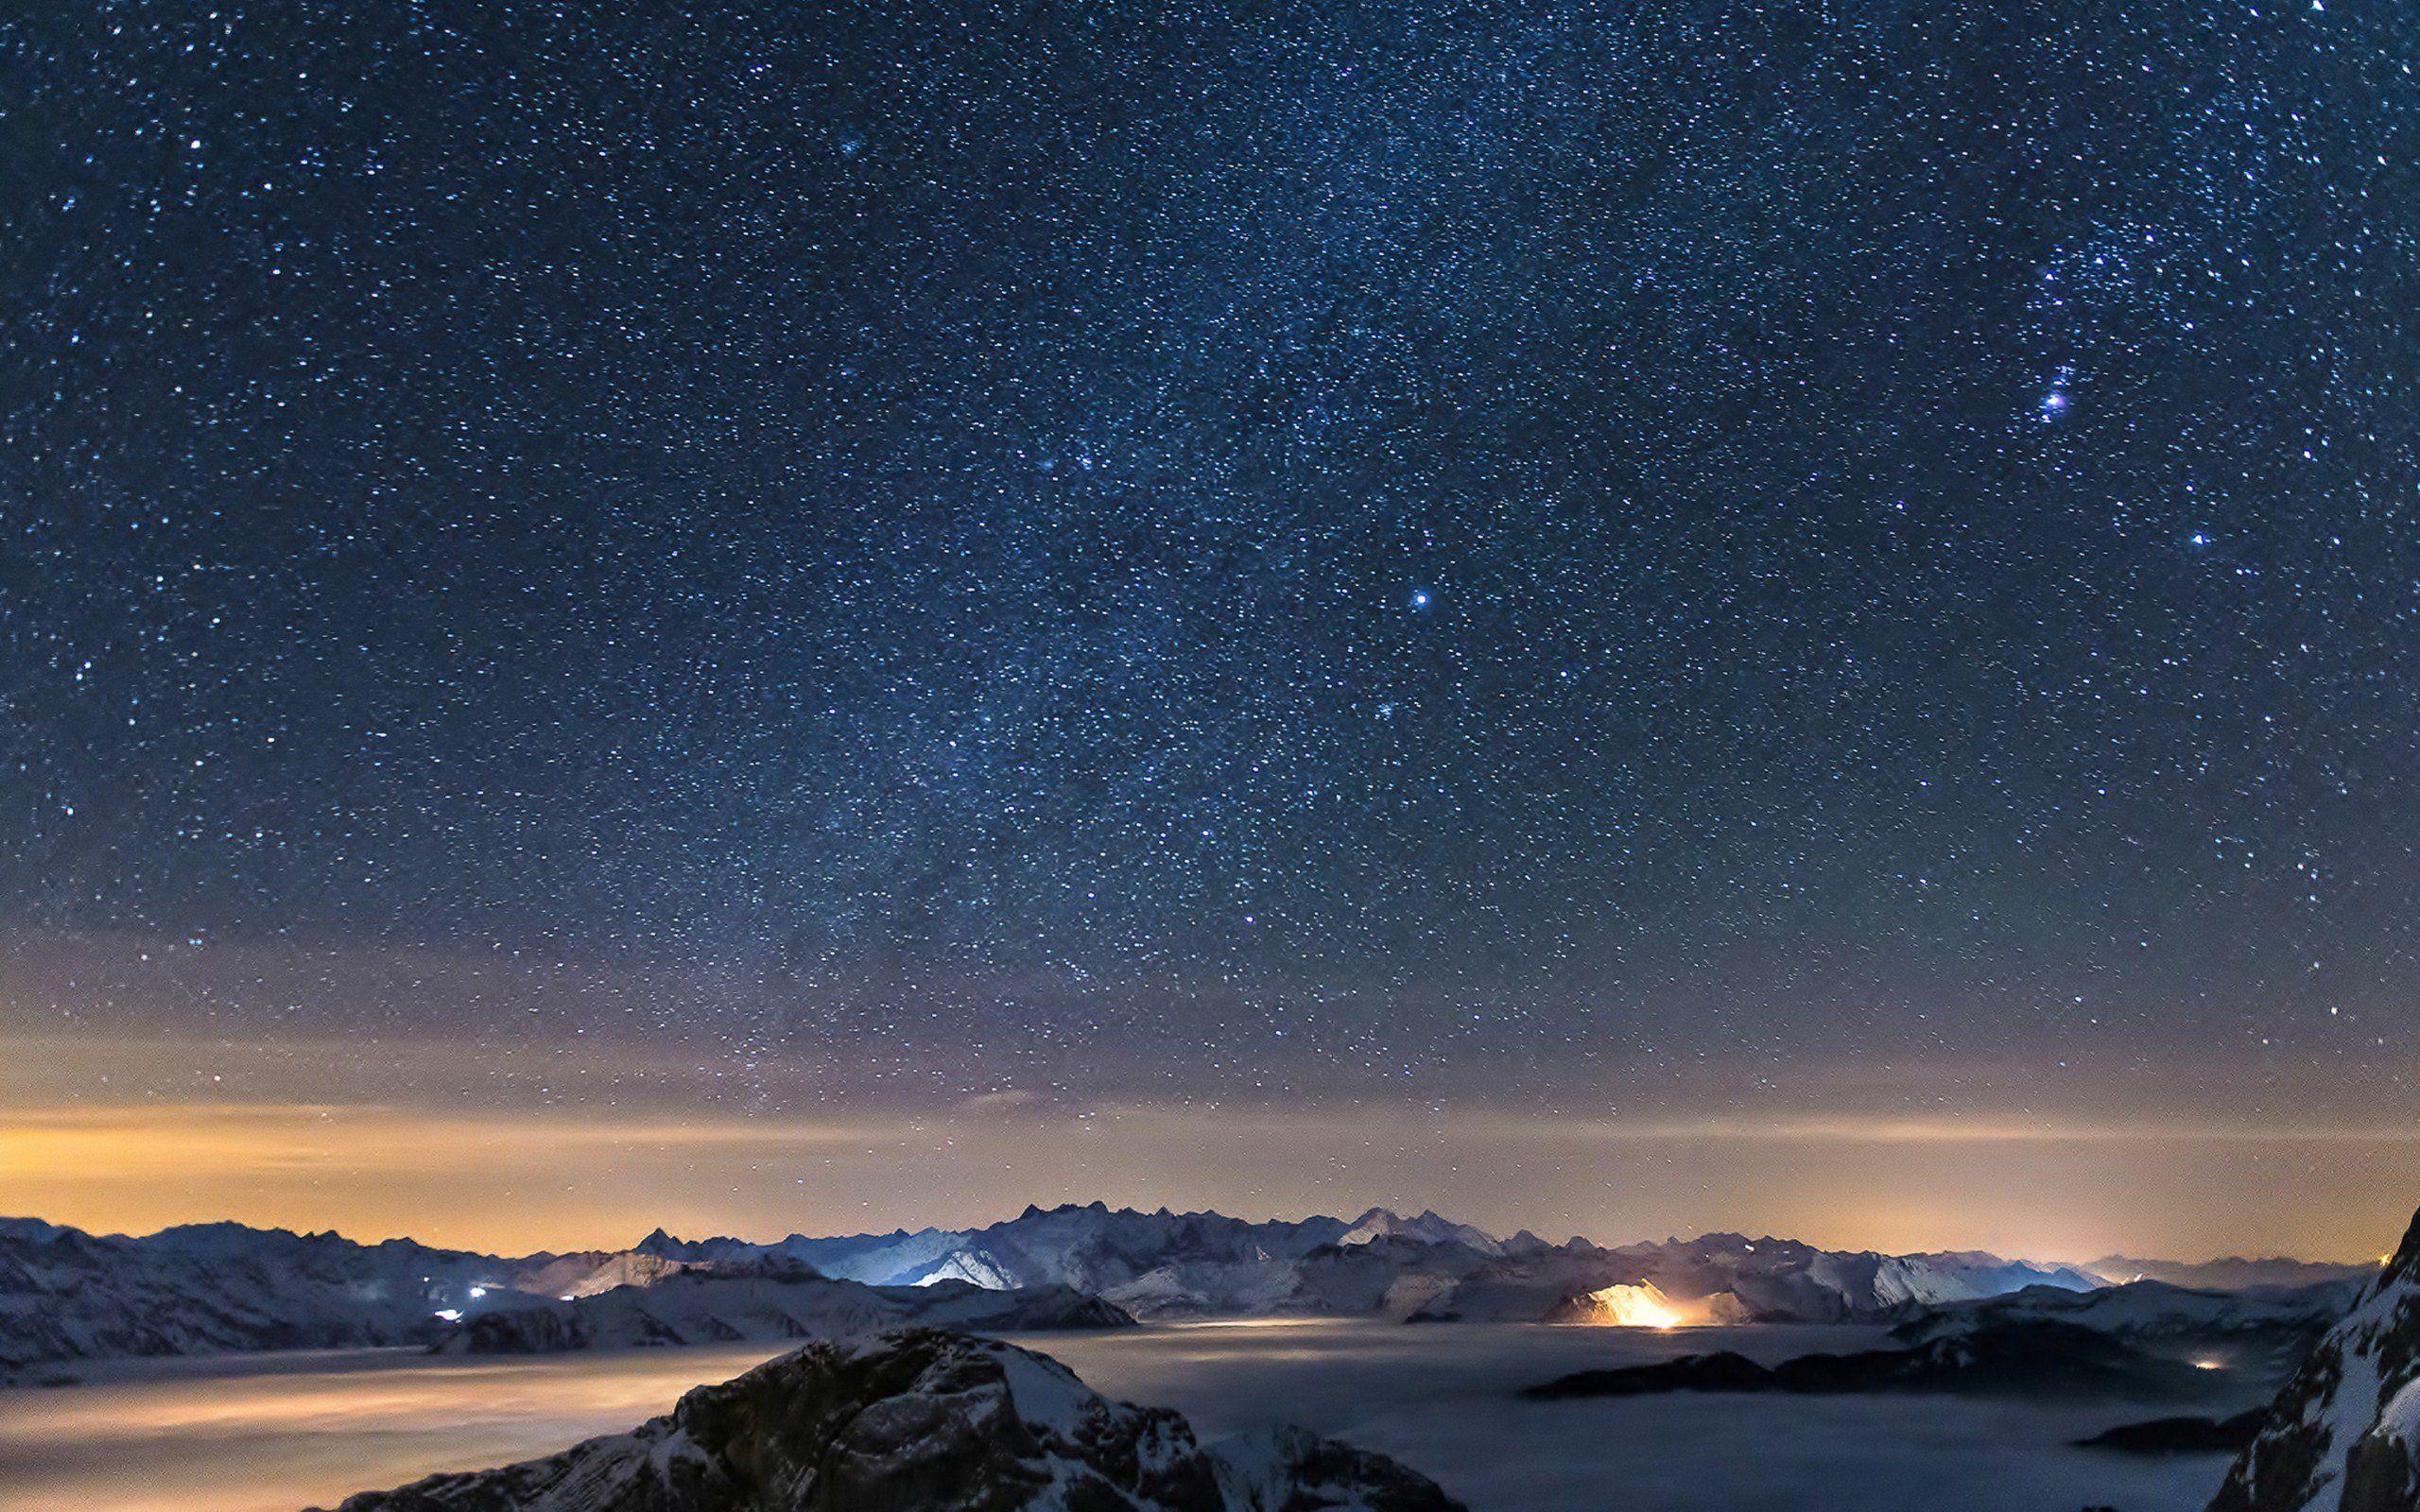 Cosmos Galaxy Night Landscape Landscape Background Landscape Wallpaper